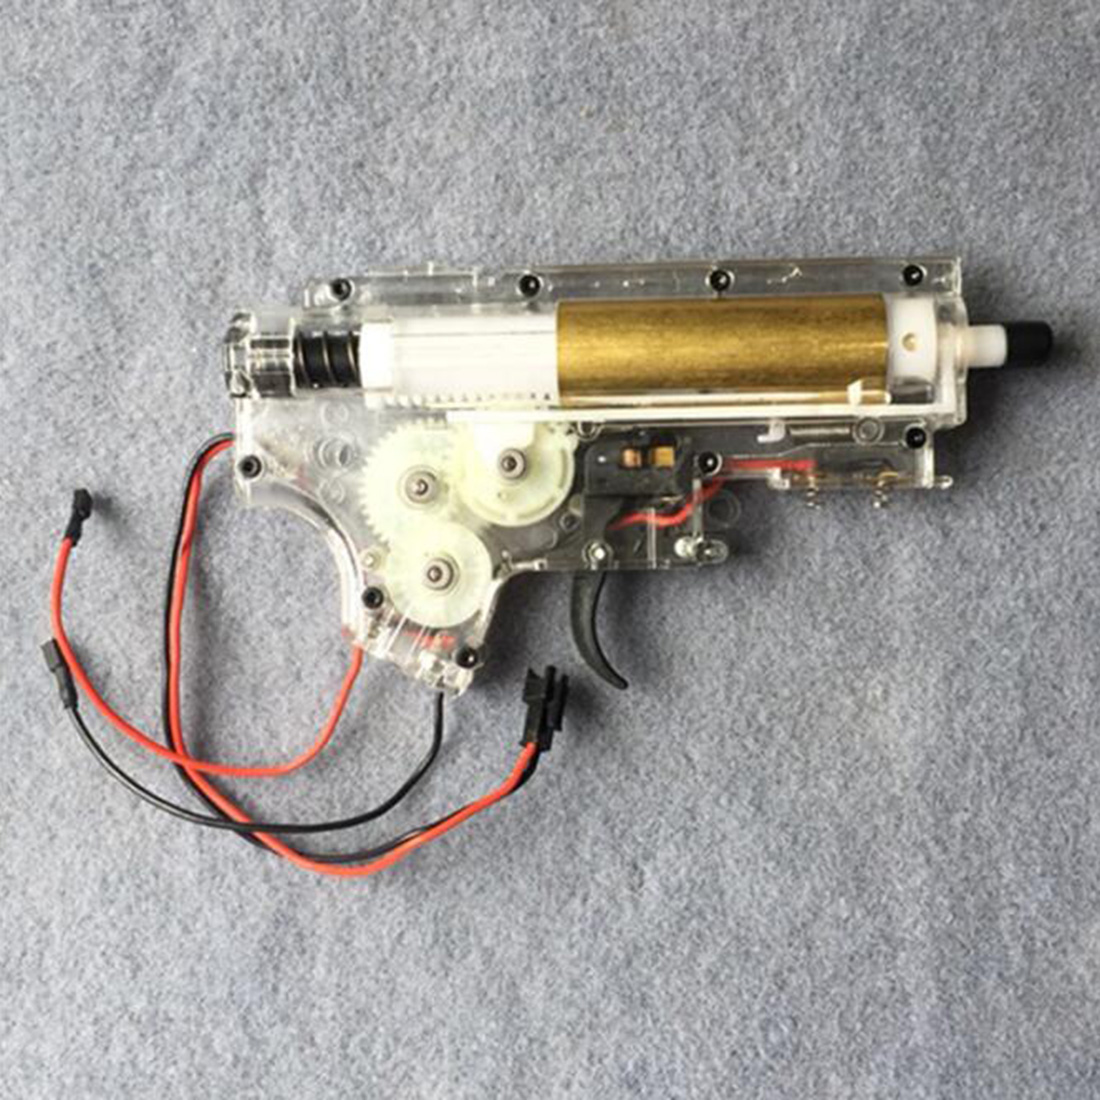 Original PC Gearbox for JM Gen 9 M4A1 Water Gel Beads Blaster - Transparent